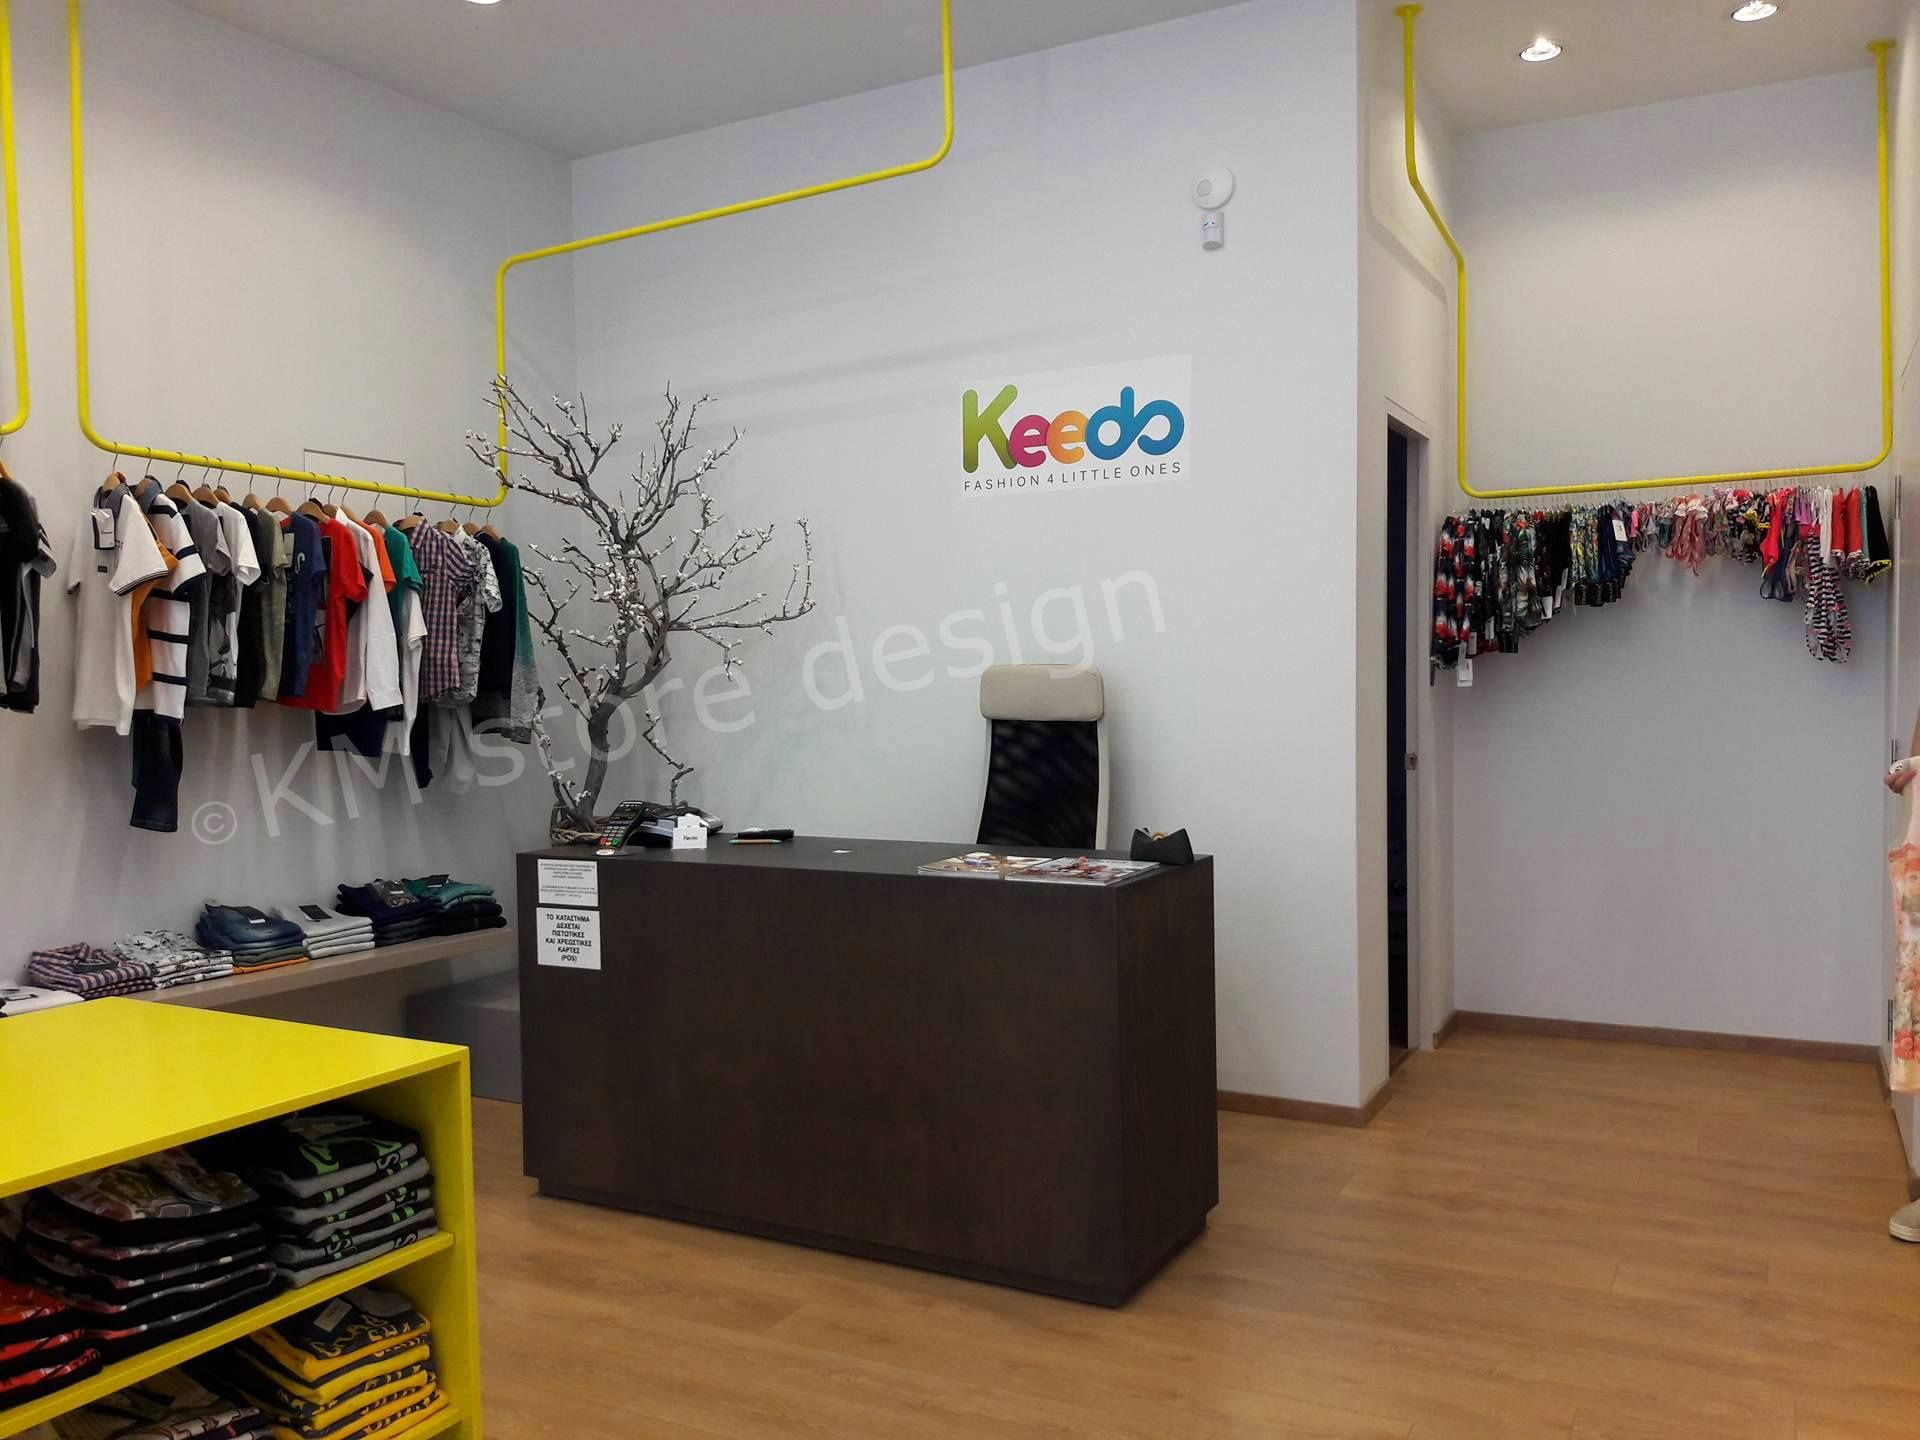 eab7a04a097 Η KM store design έφερε εις πέρας τον εξοπλισμό καταστήματος με παιδικά  ρούχα στο Μαρούσι.